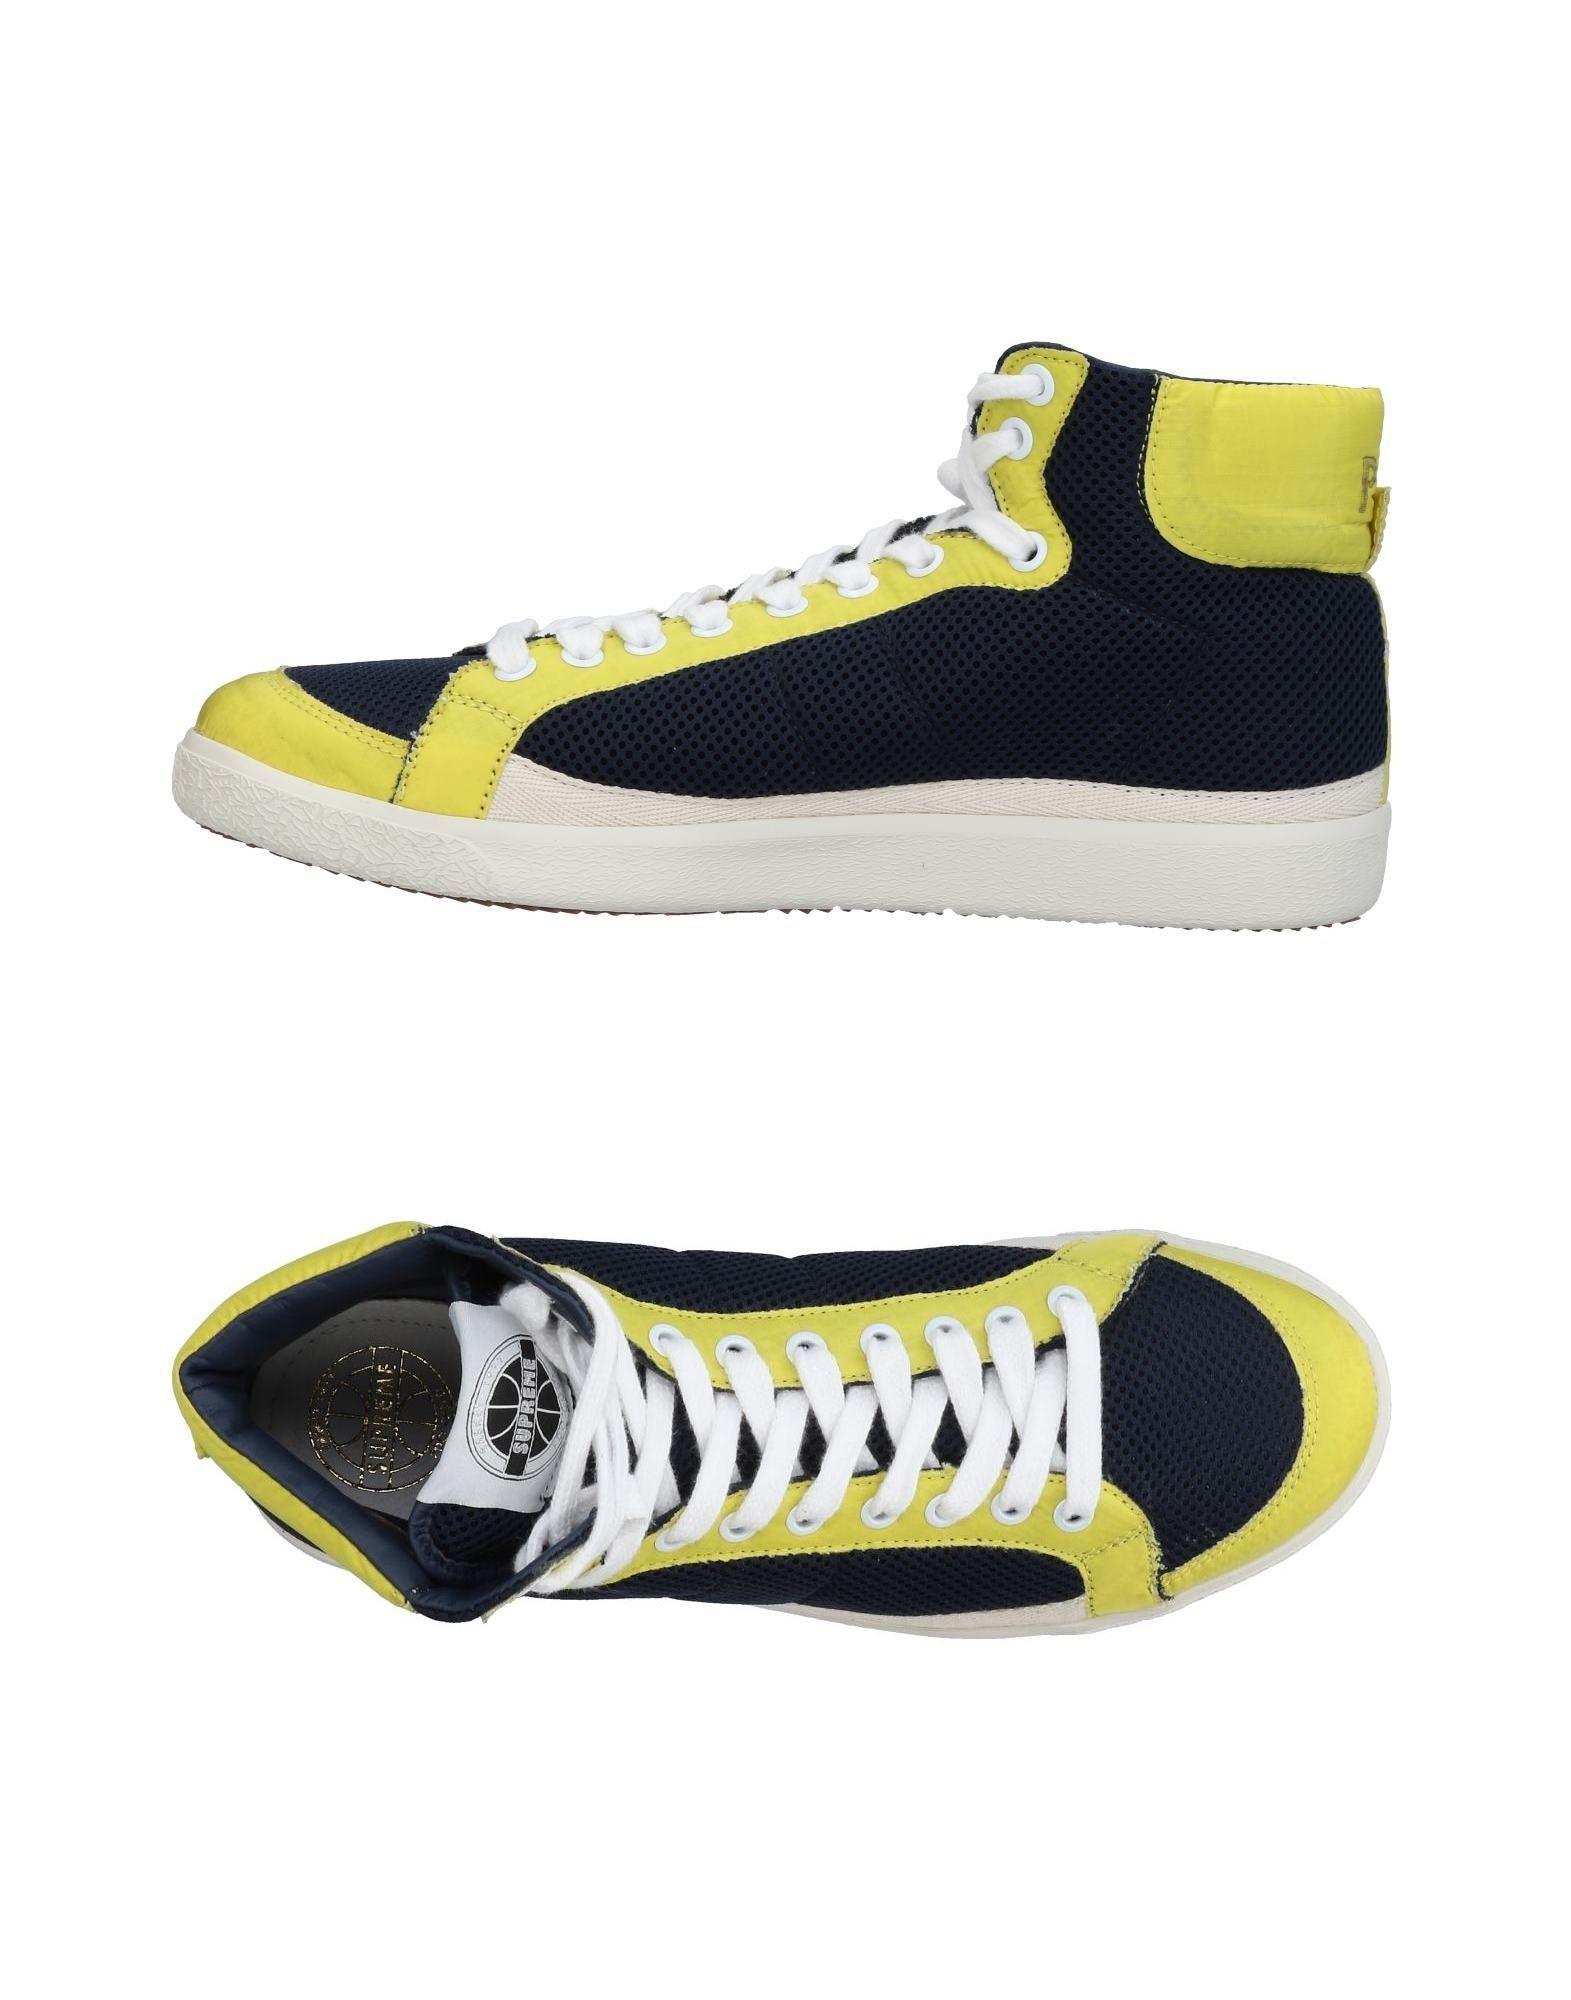 Pantofola D'oro Sneakers Herren  Schuhe 11456469TI Gute Qualität beliebte Schuhe  06f951